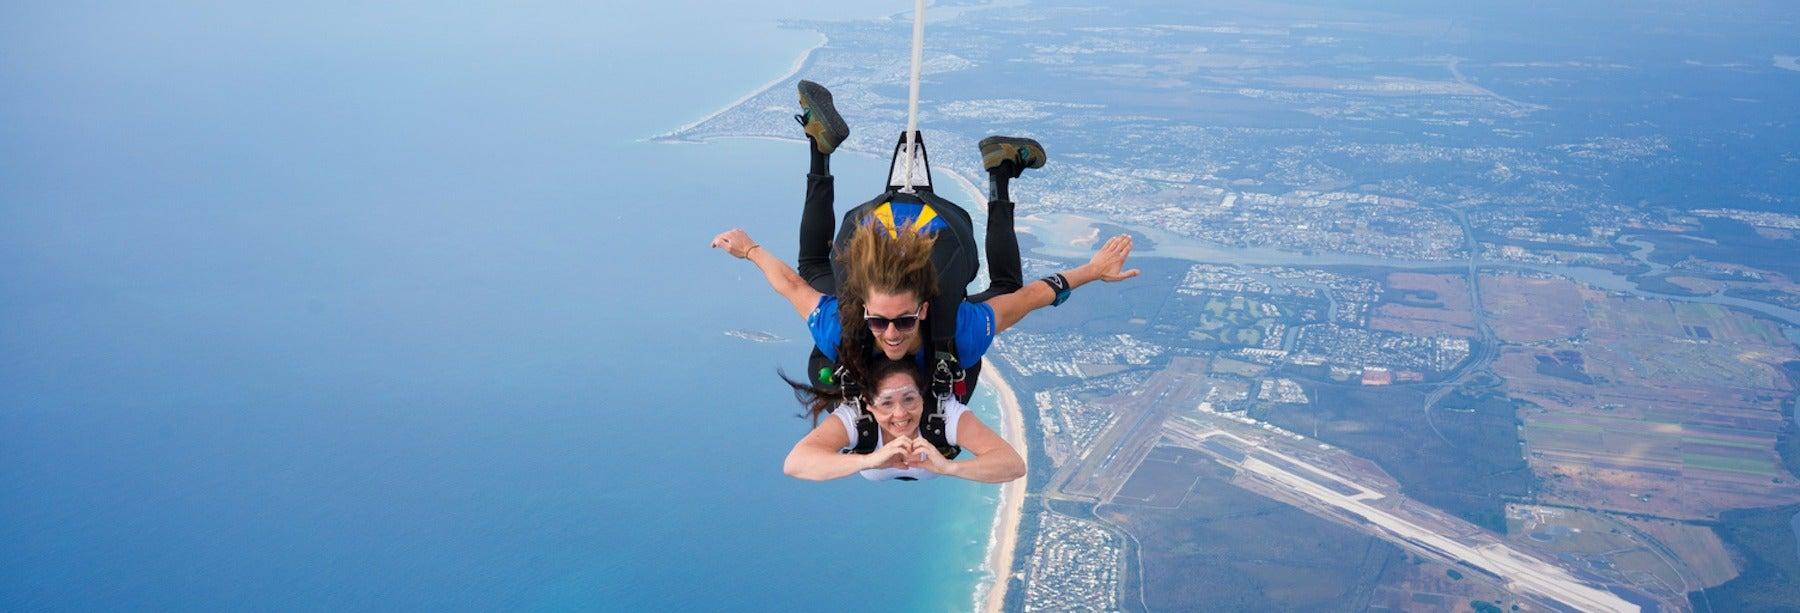 Lancio in paracadute a Noosa Heads